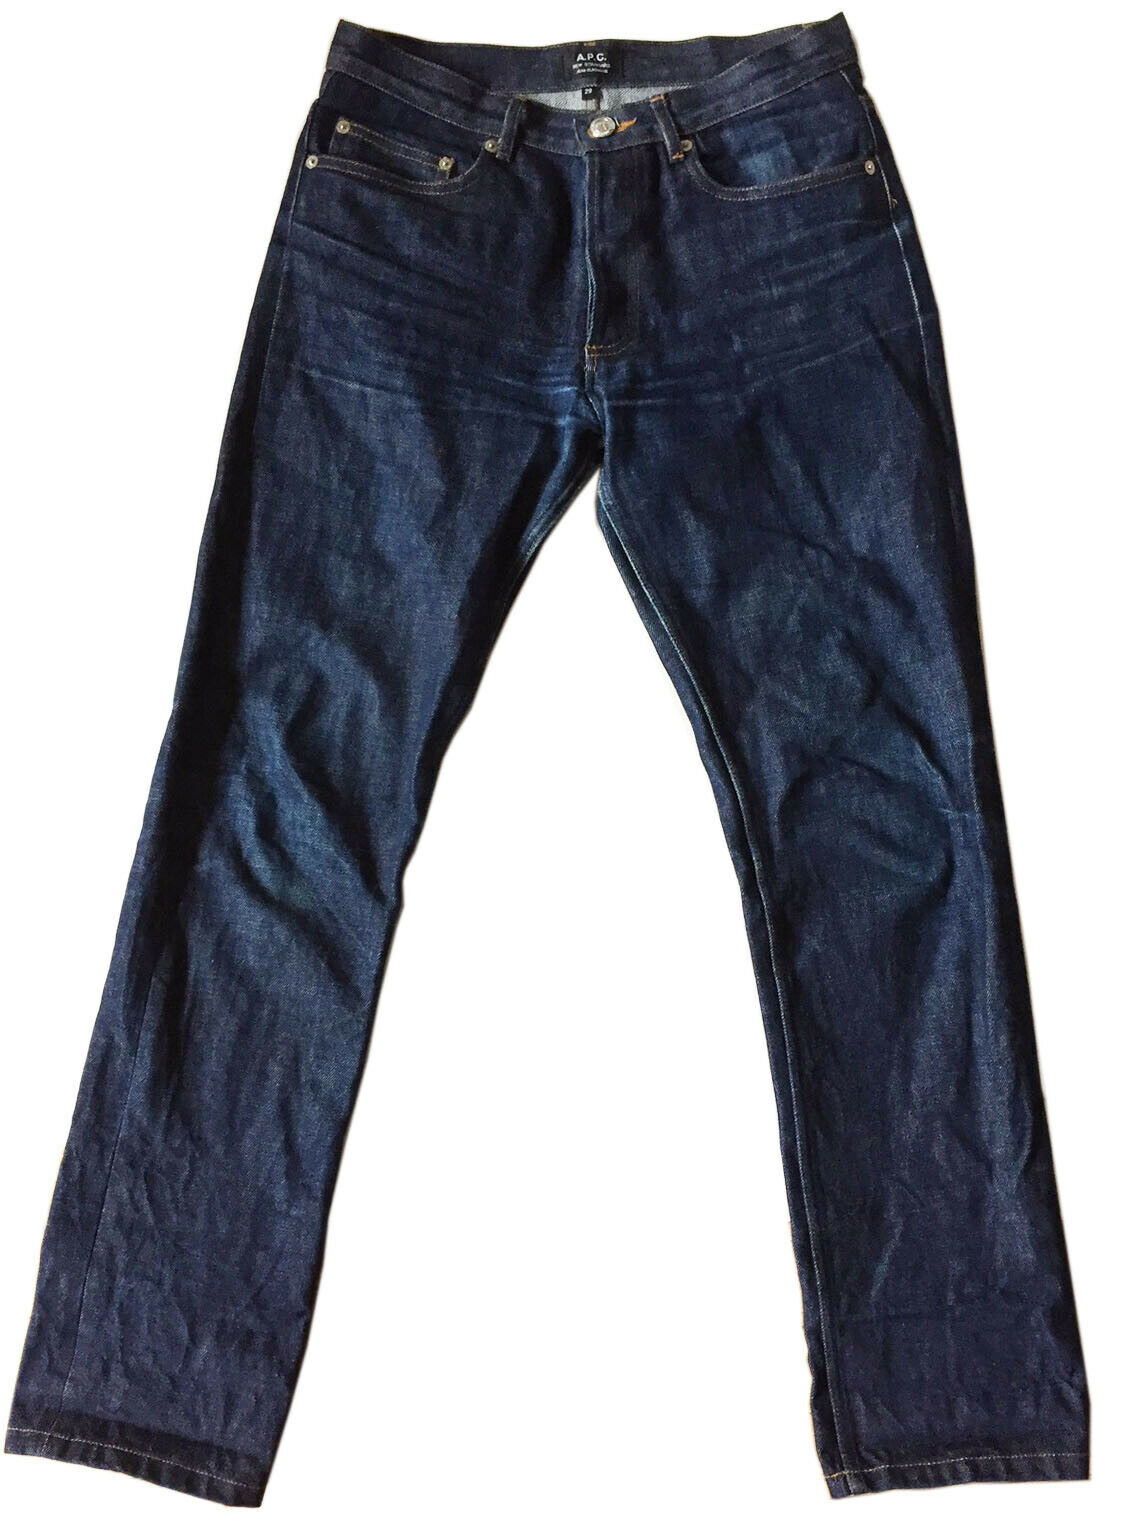 A.P.C.  New Standard Jean Classique  Button-Fly bluee Denim Sz 29 Unisex-Cut